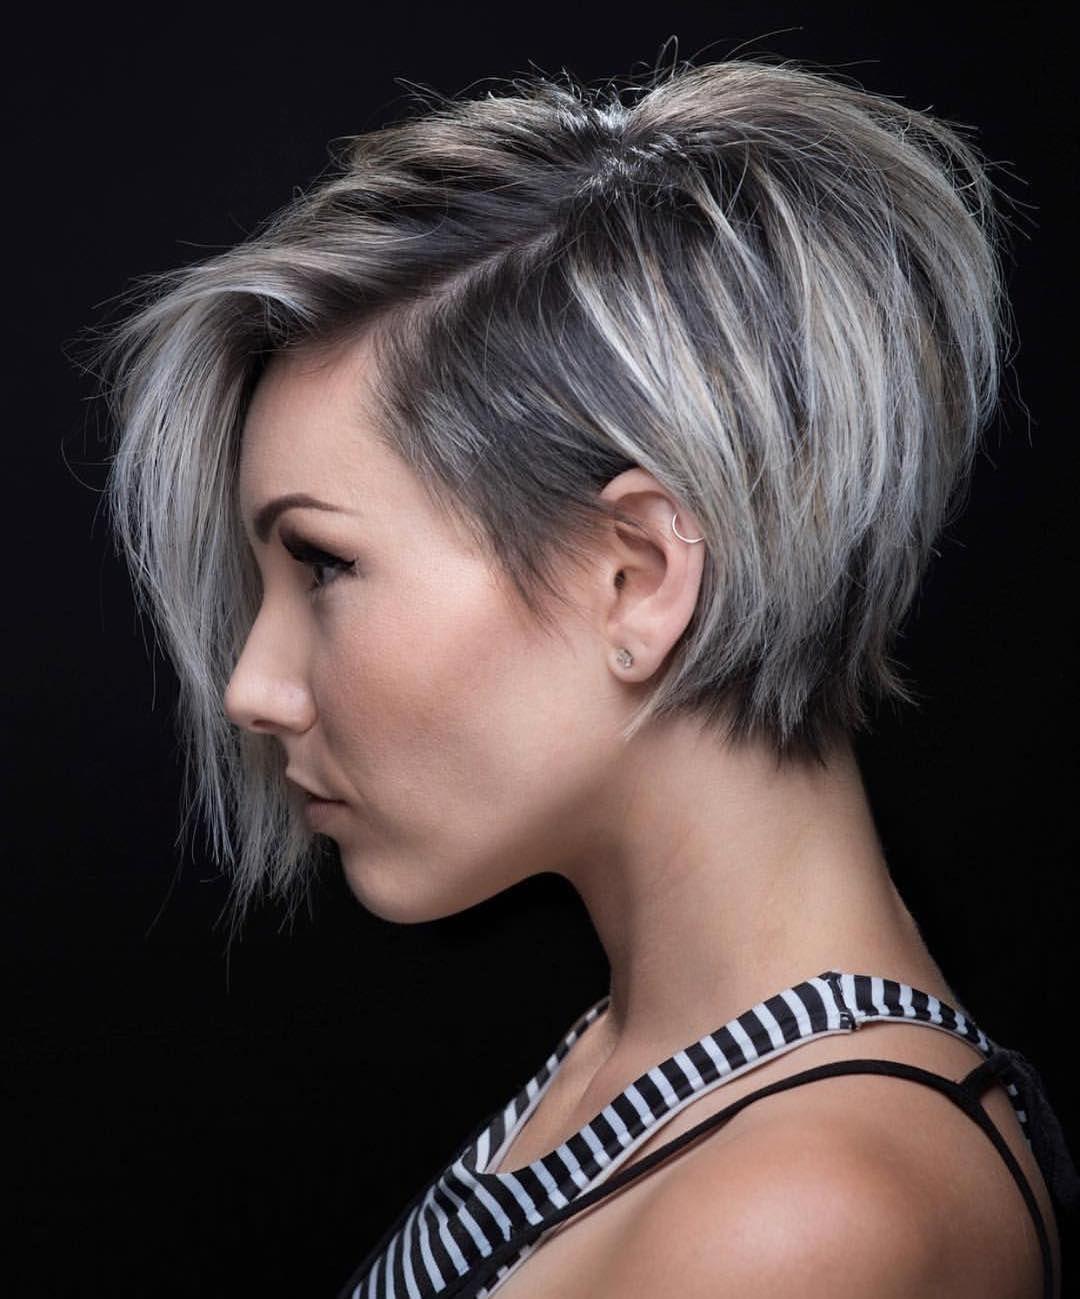 "7,690 Me gusta, 54 comentarios - @shorthair_love en Instagram: ""@chloenbrown hair by @andrewdoeshair #bobcut  #hairstyle #hair #haircut #shorthair #undercut…"""